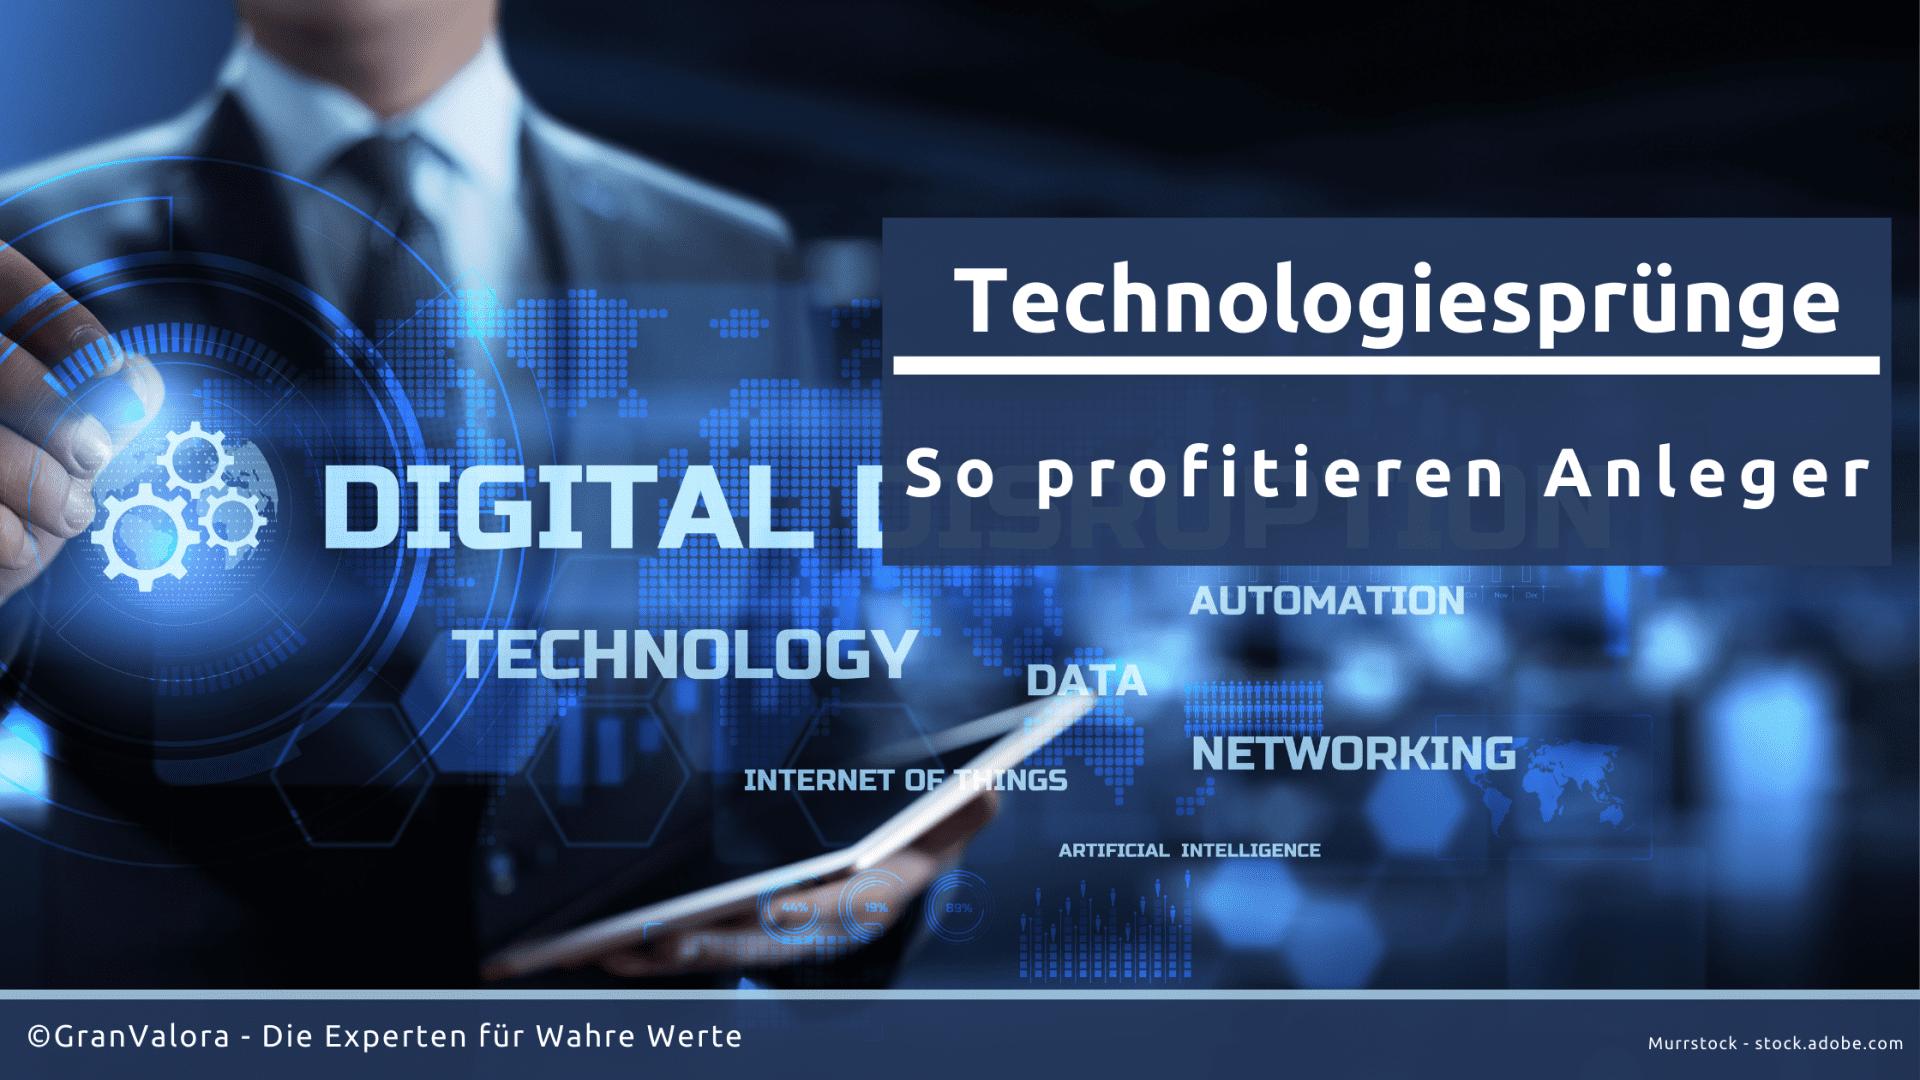 Technologiesprünge: So profitieren Anleger